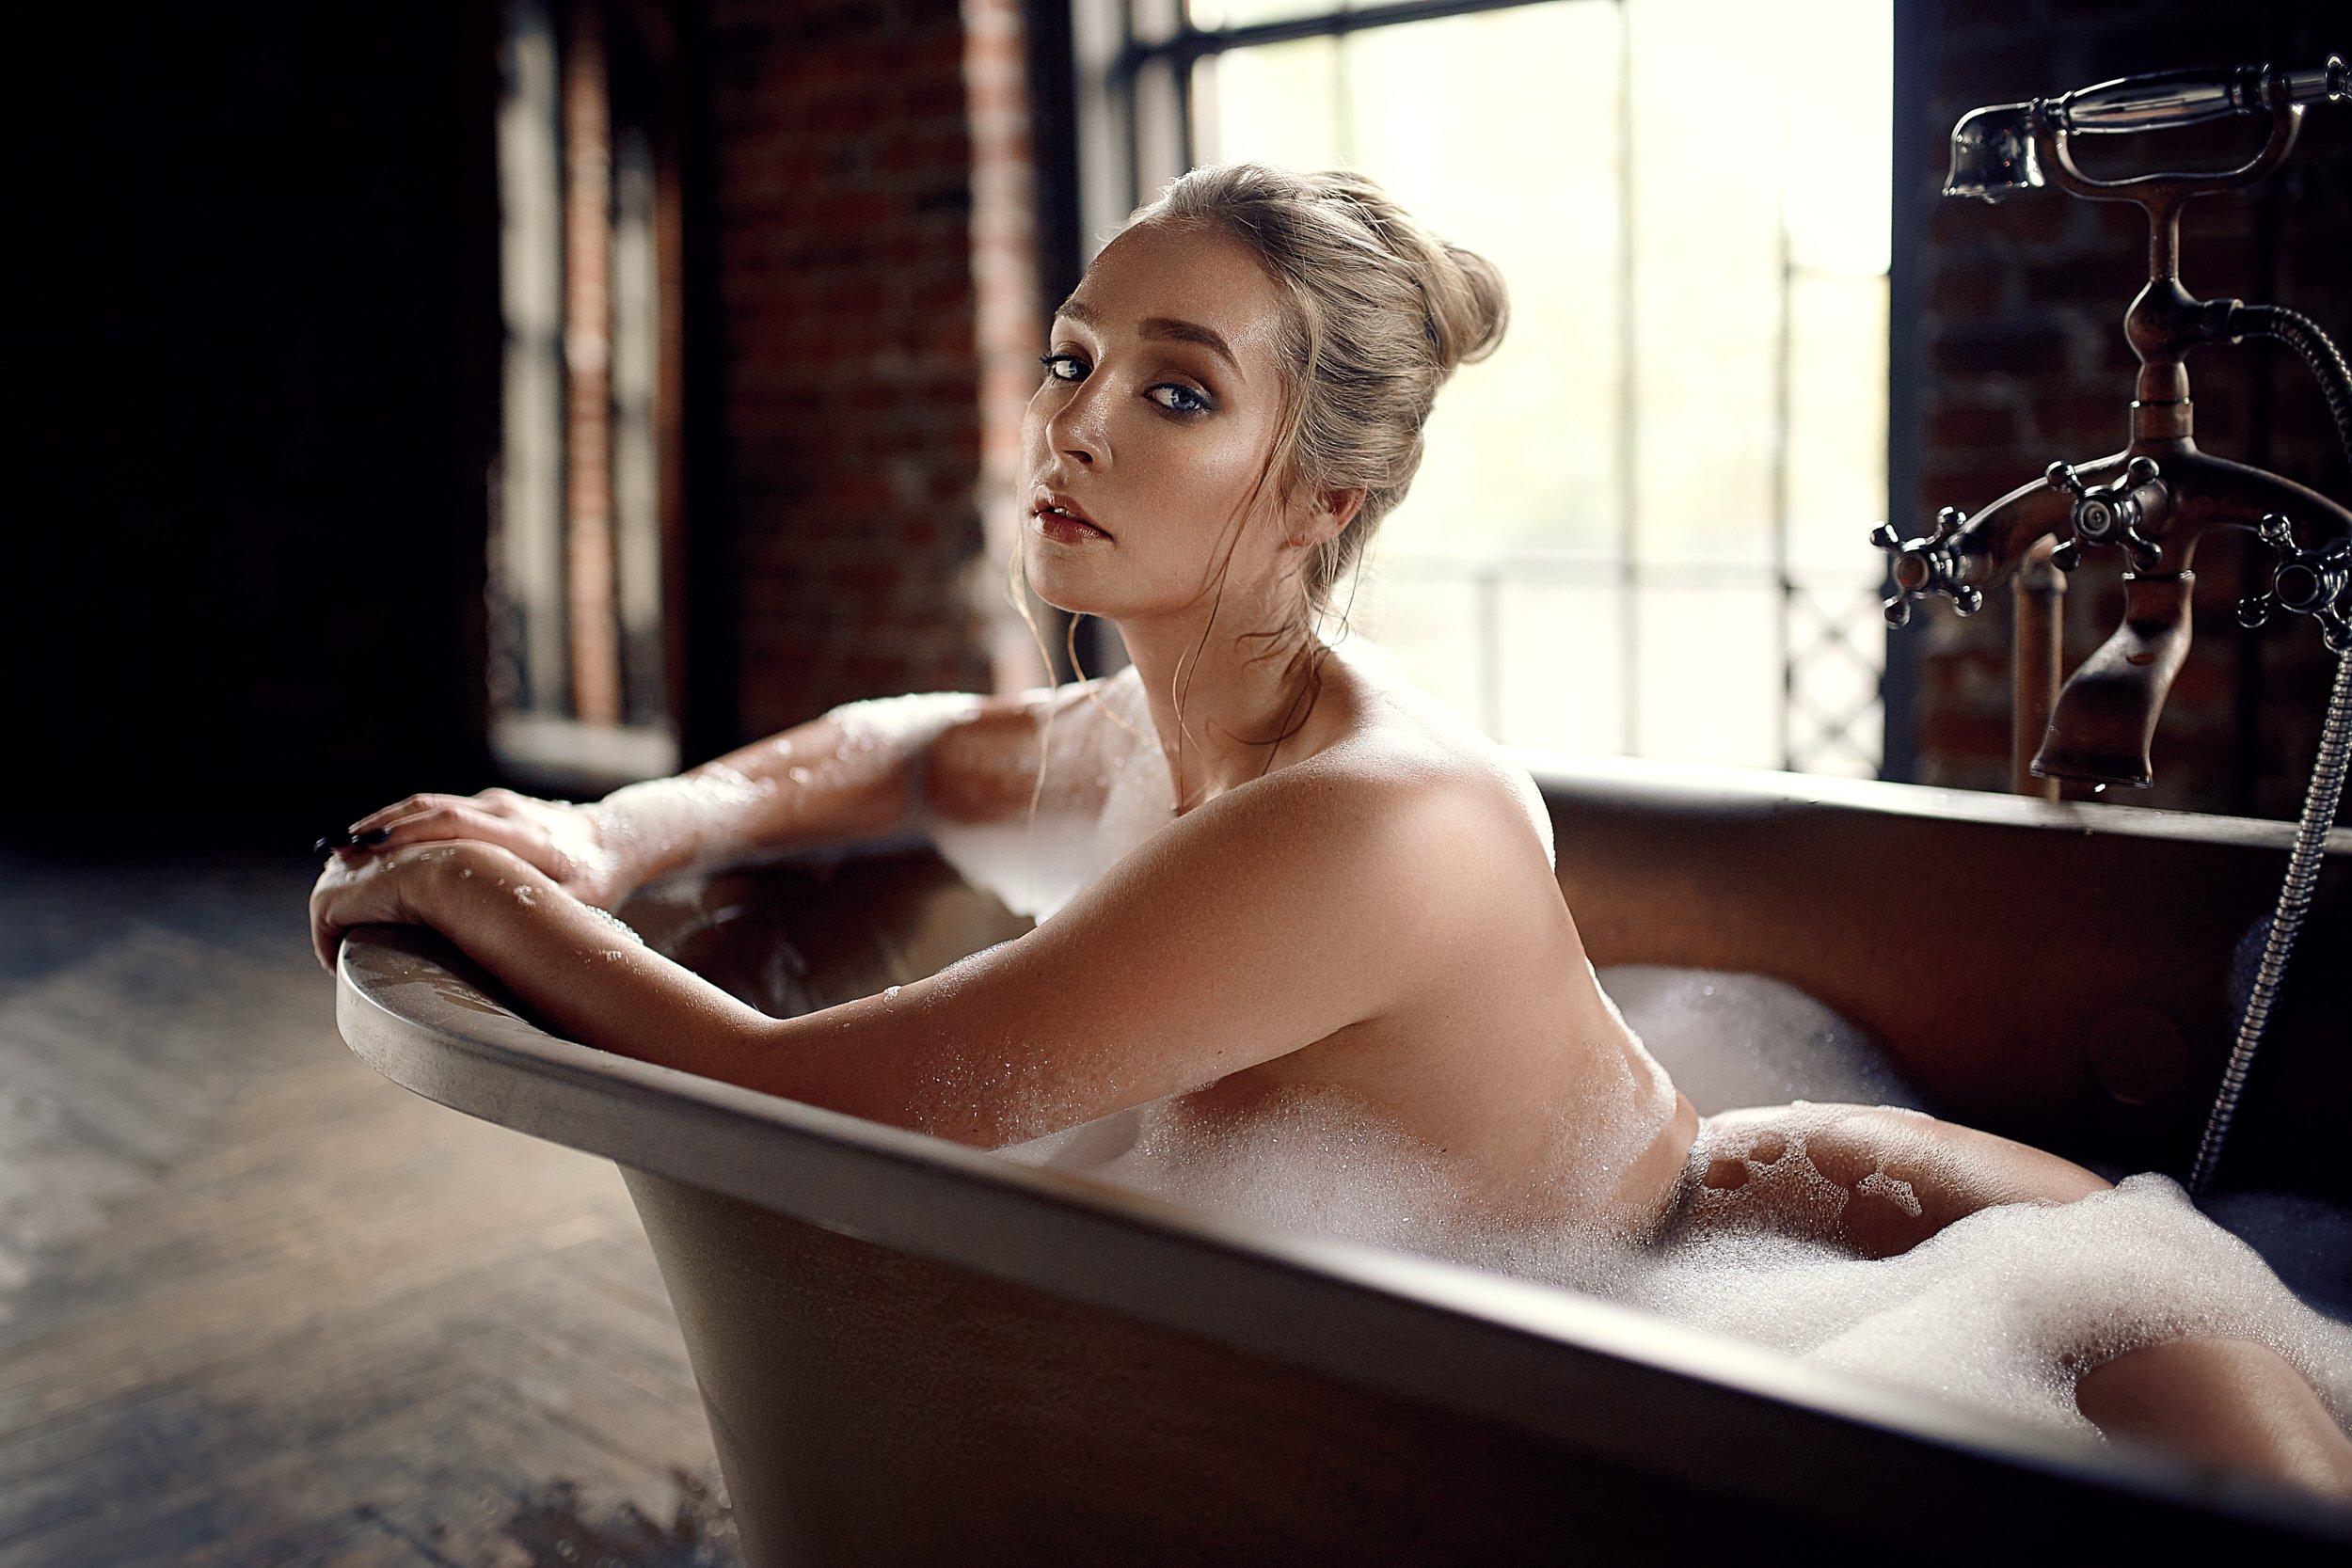 Portrait, 35mm, girl, beauty, retouch, posing, model, studio, photography, fitness, lingerie, sexy, sigma, sony, a7iii, a7m3, art, light, hair, bazarov, glamour, fashionable, elegant, fashion, style, pretty, doberman, awesome, Михаил Базаров